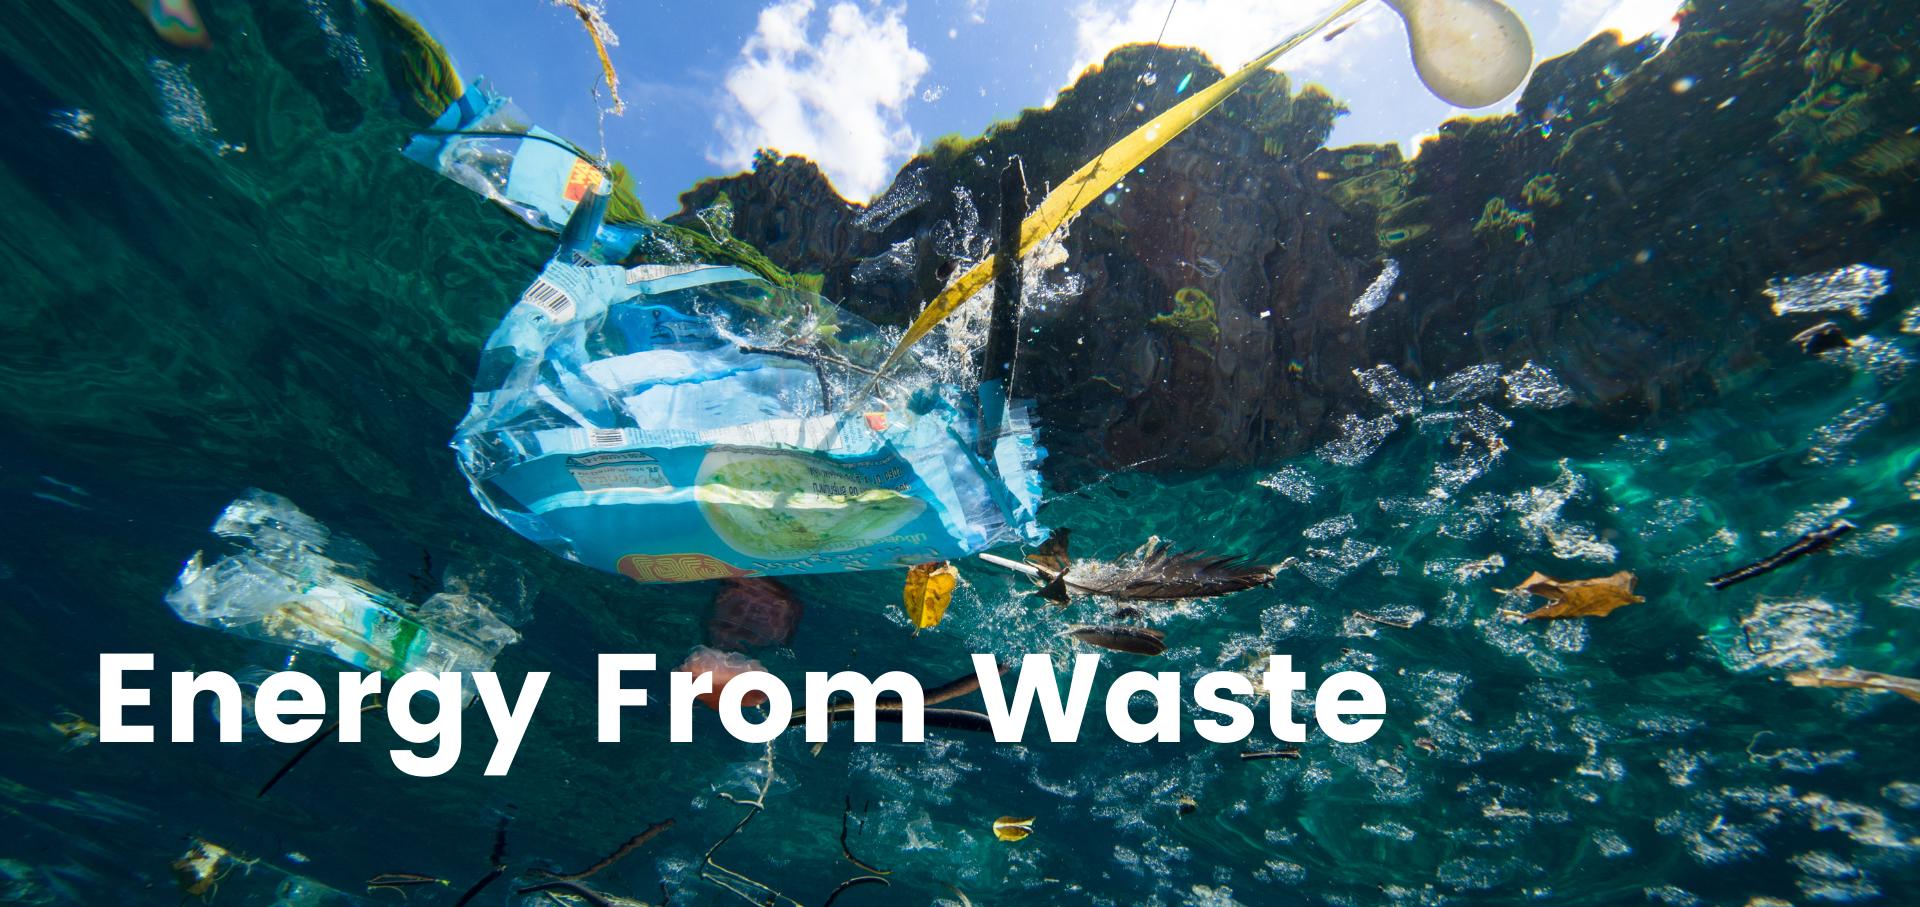 energy from waste case studies engsolve renewable engineering consultancy